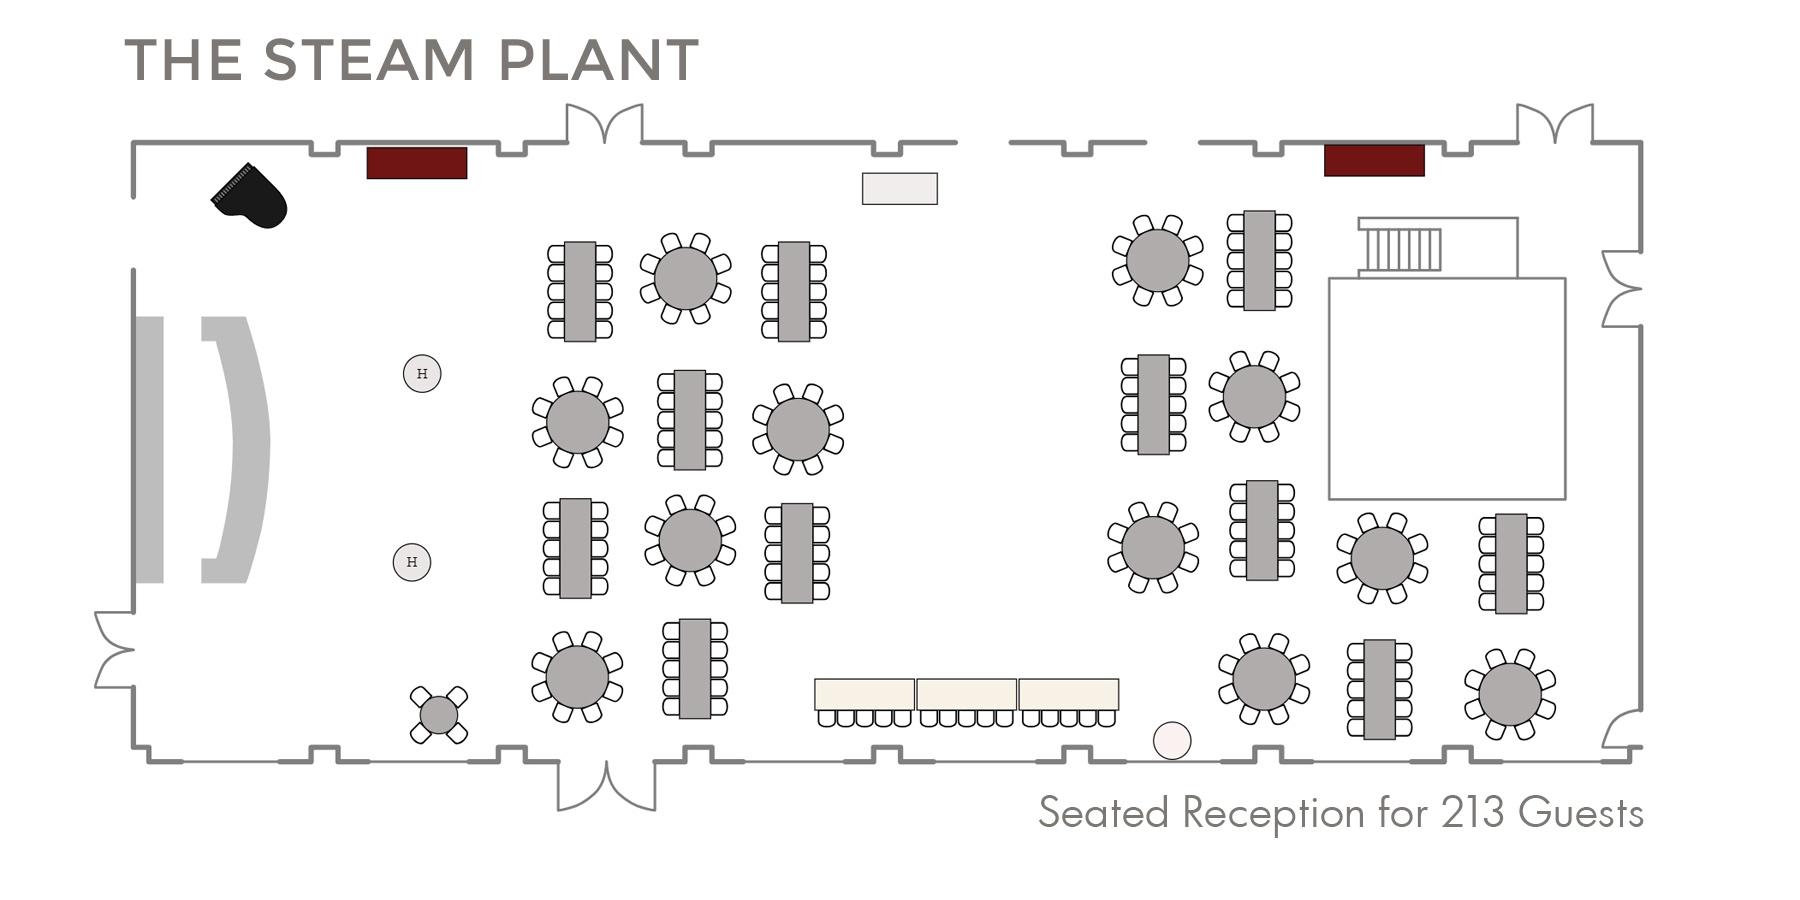 Steam-Plant-Wedding-Floor-plan-dayton-event-rental-elite-catering.jpg